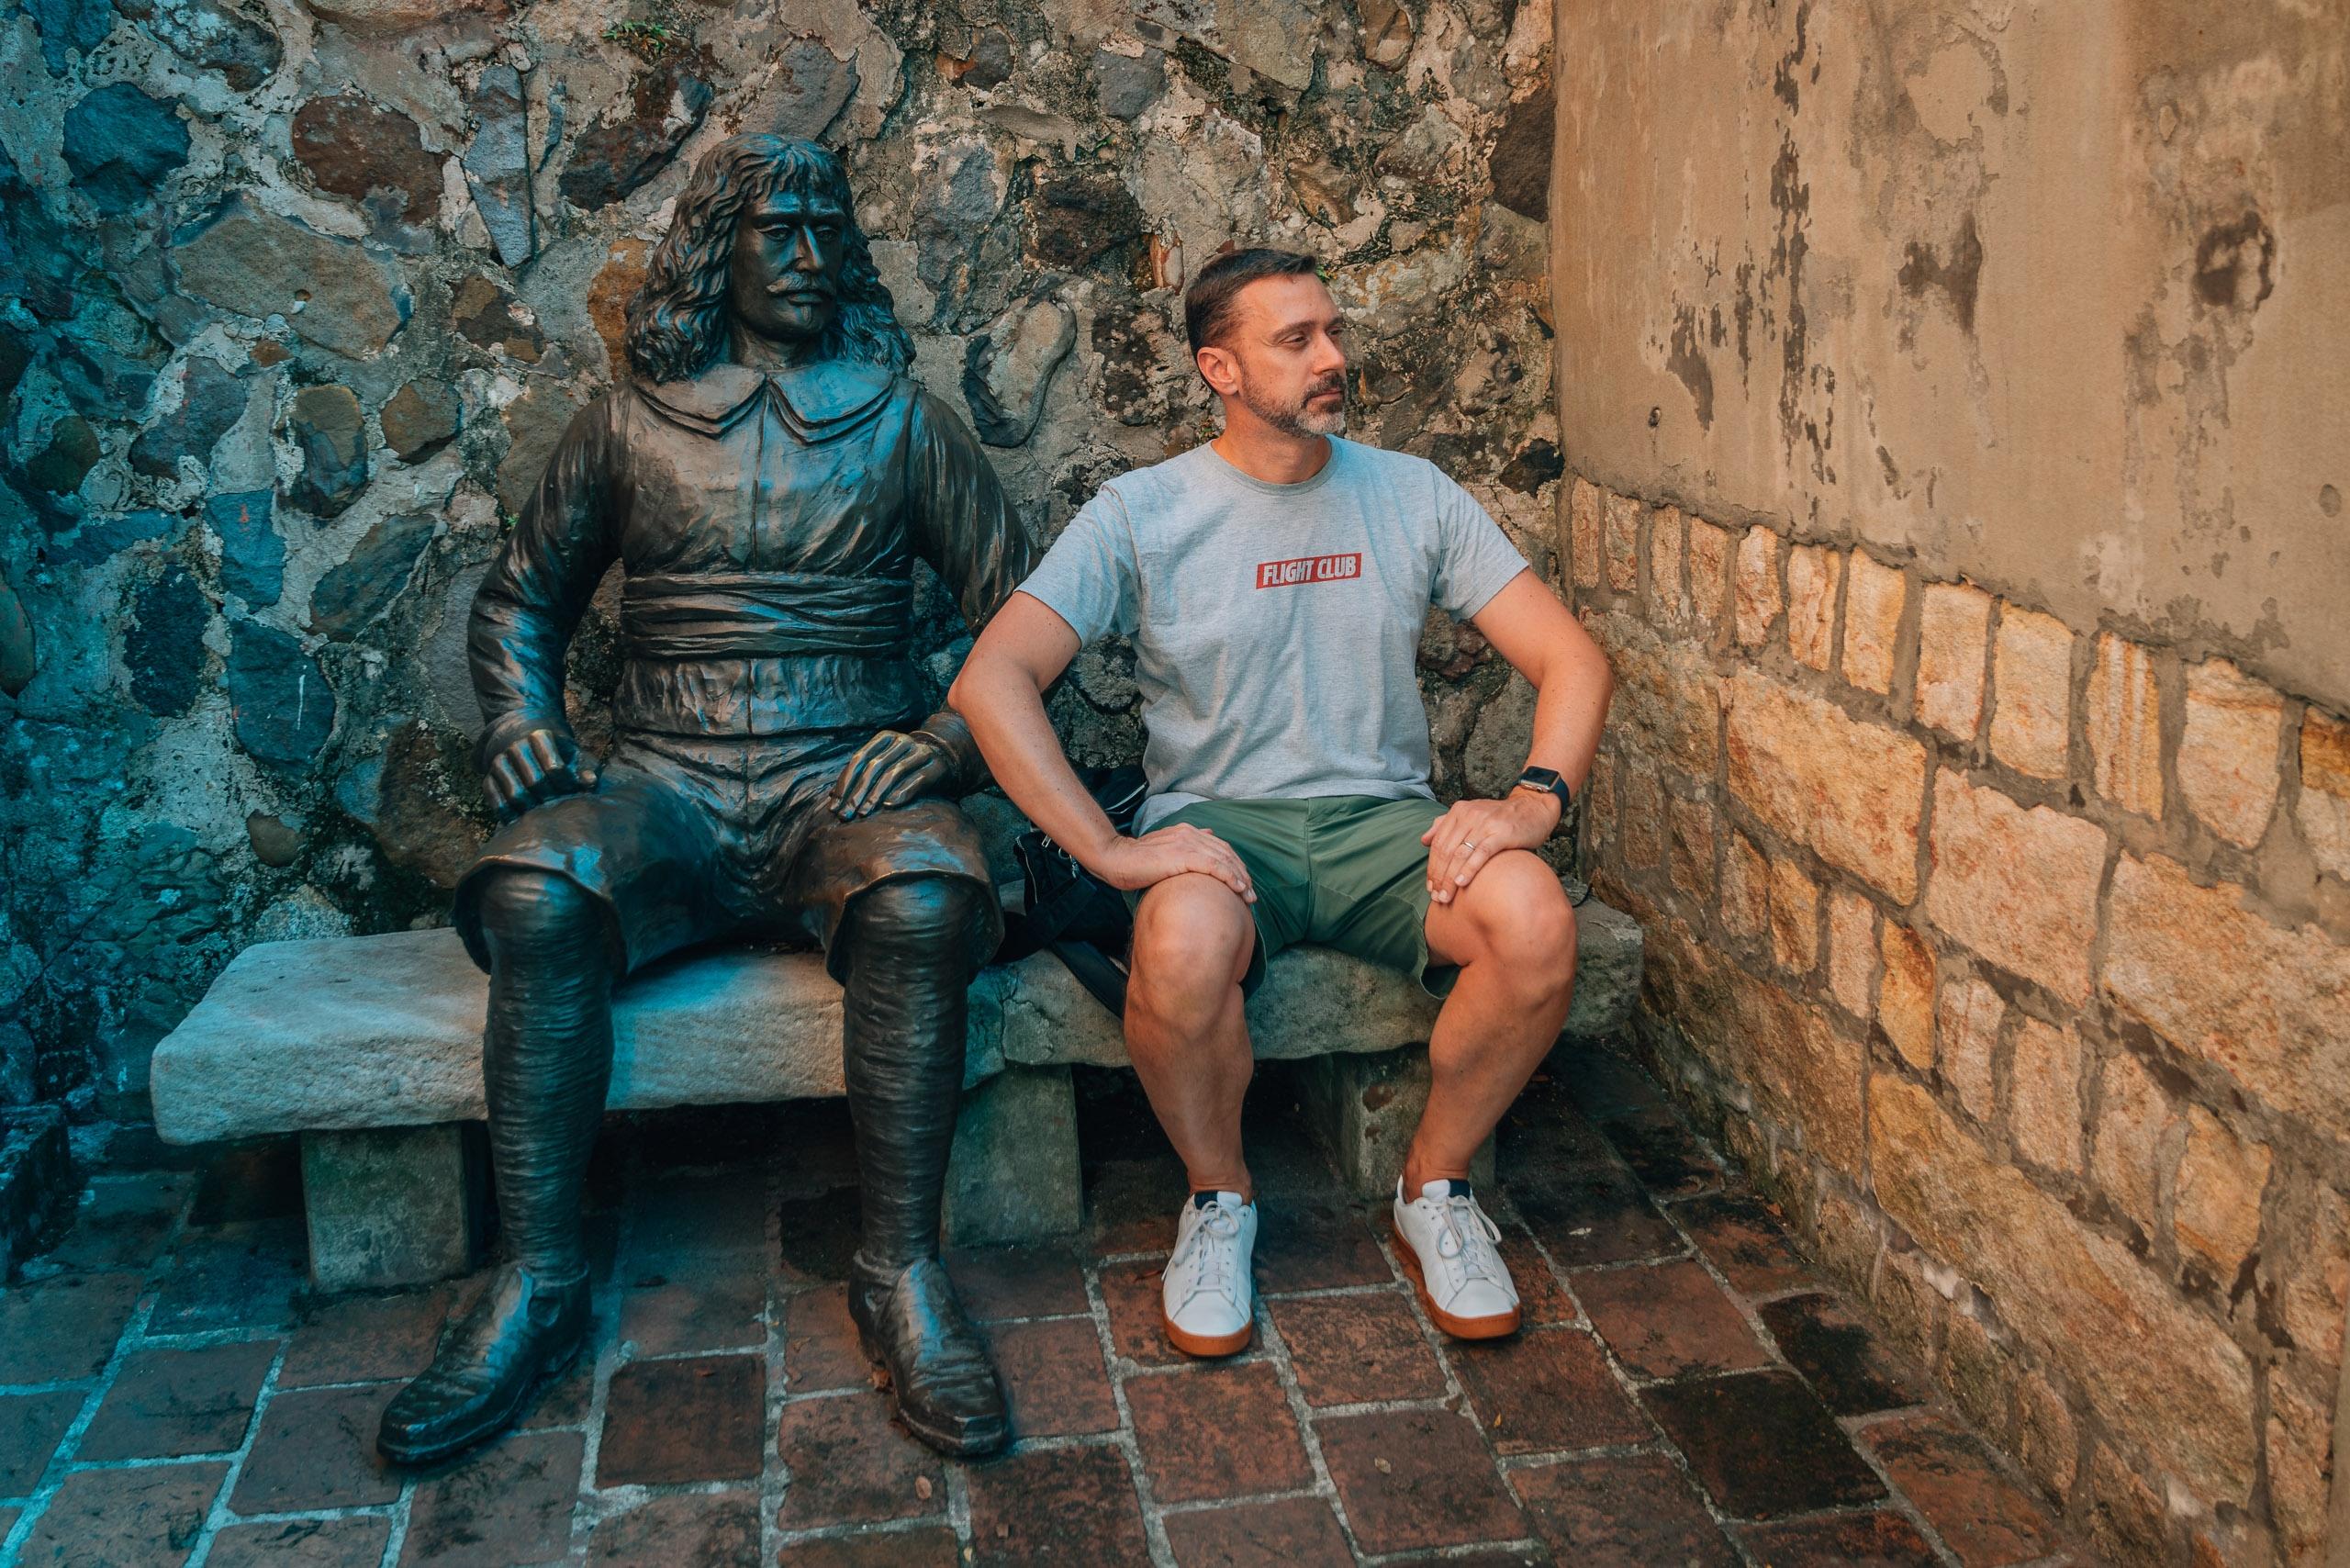 Kris and a Statuesque Friend